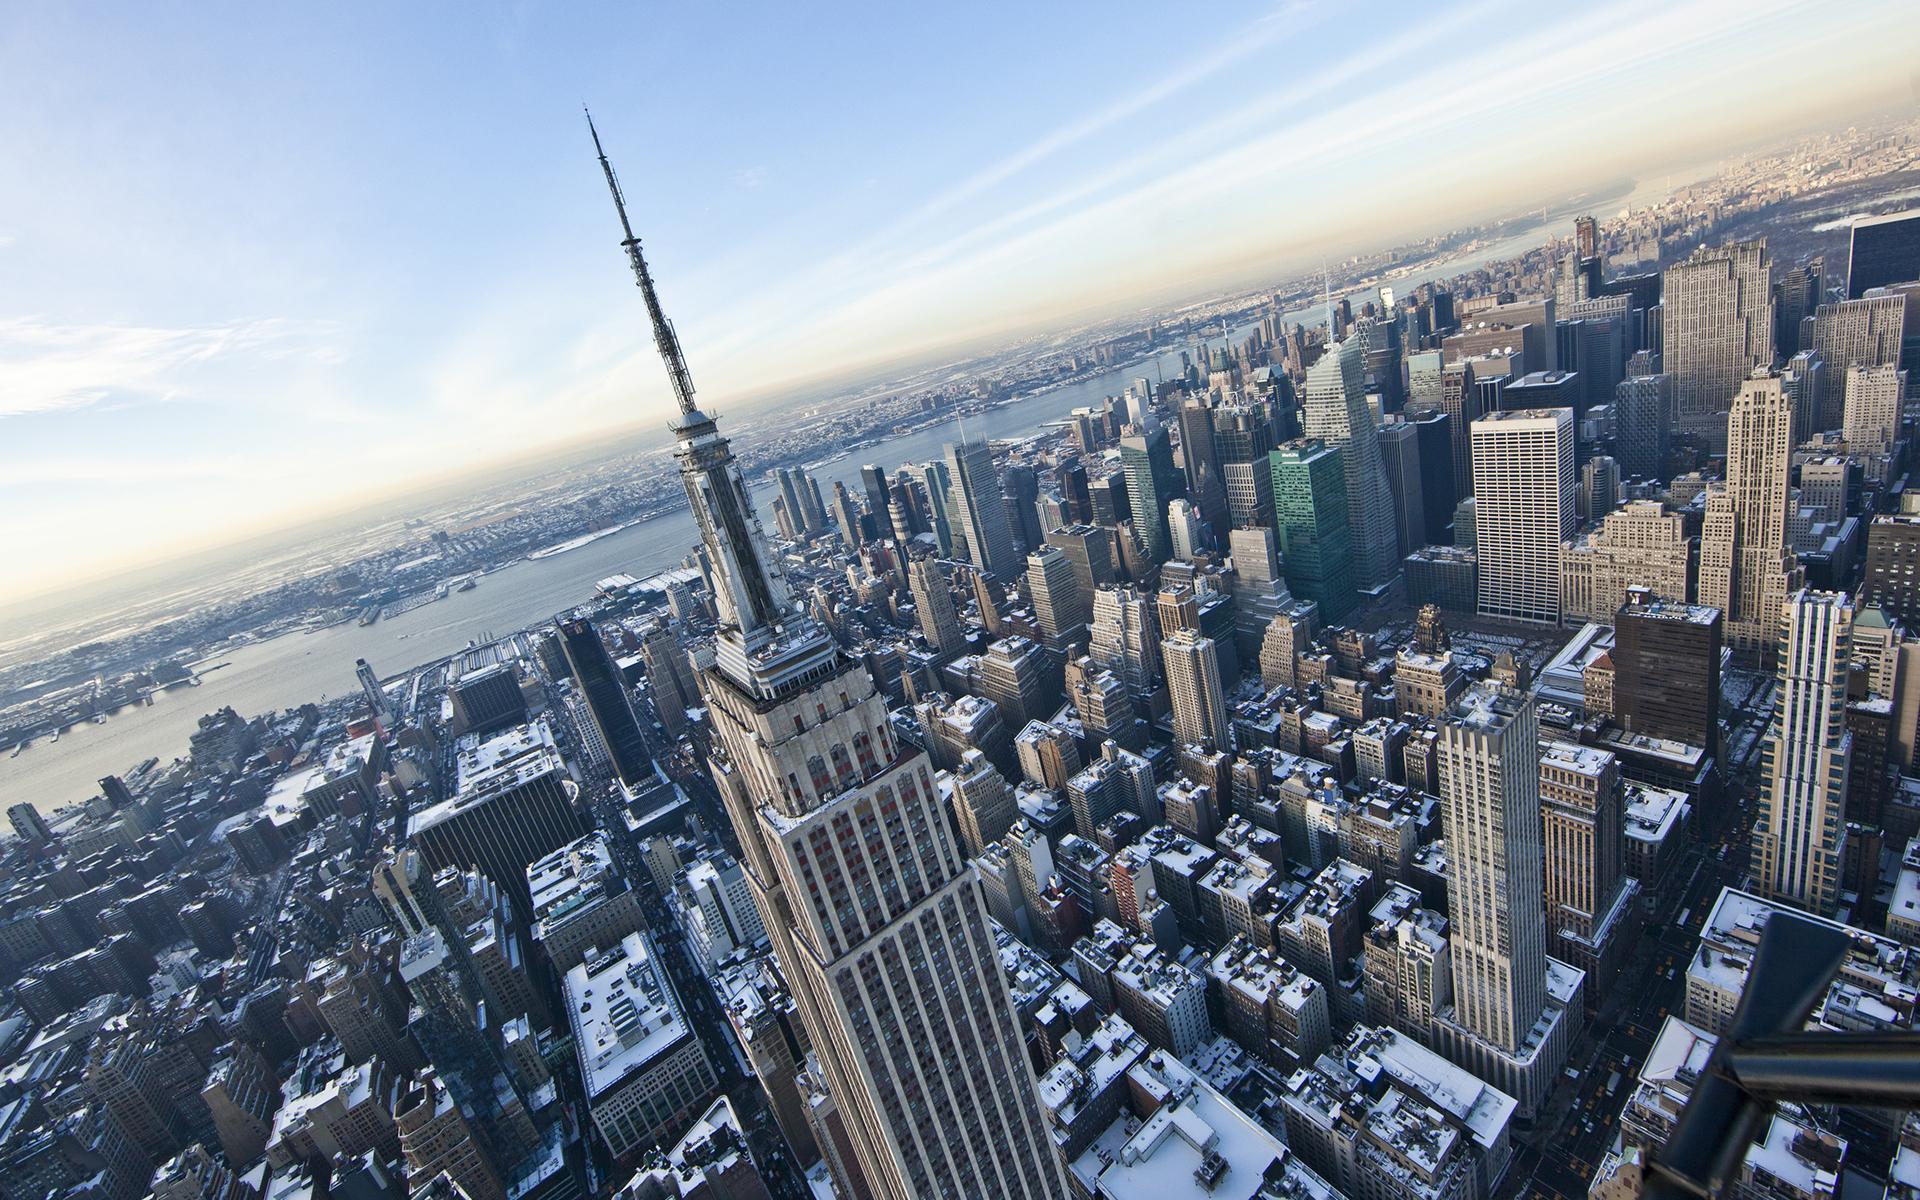 New York Buildings Skyscrapers Winter wallpaper 1920x1200 123754 1920x1200